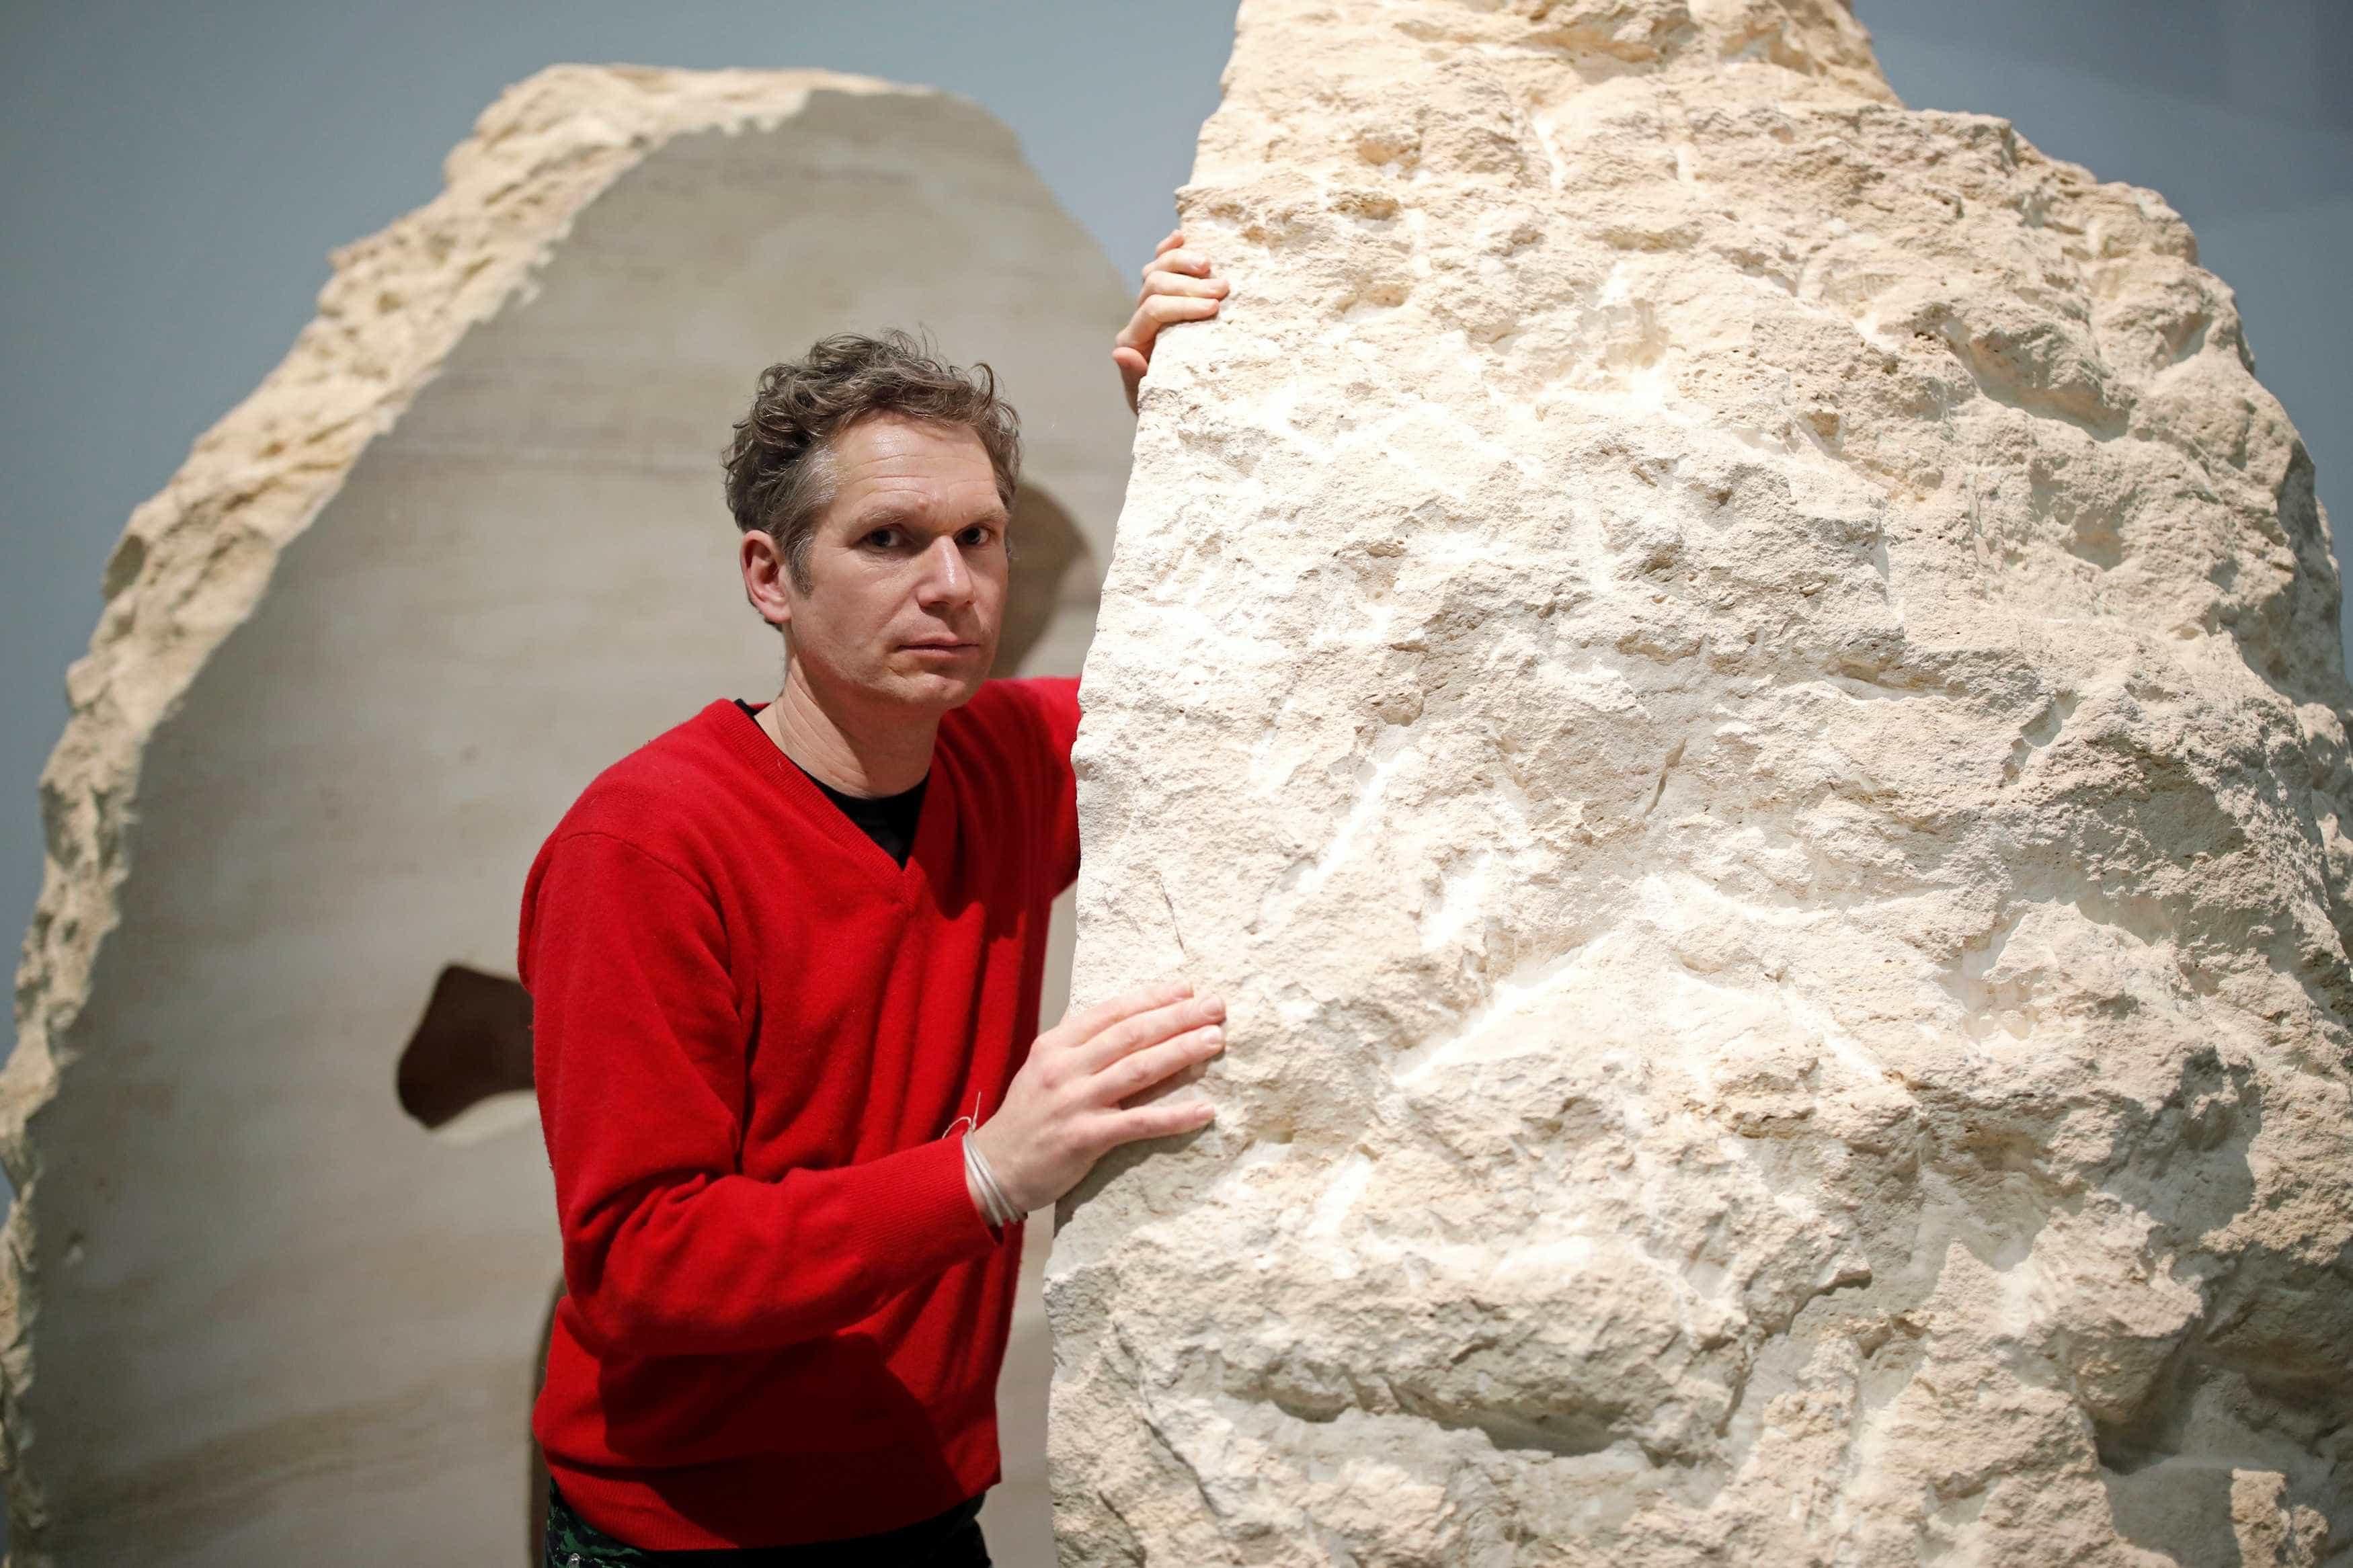 Artista 'fecha-se' durante dias no interior de rochedo de 12 toneladas